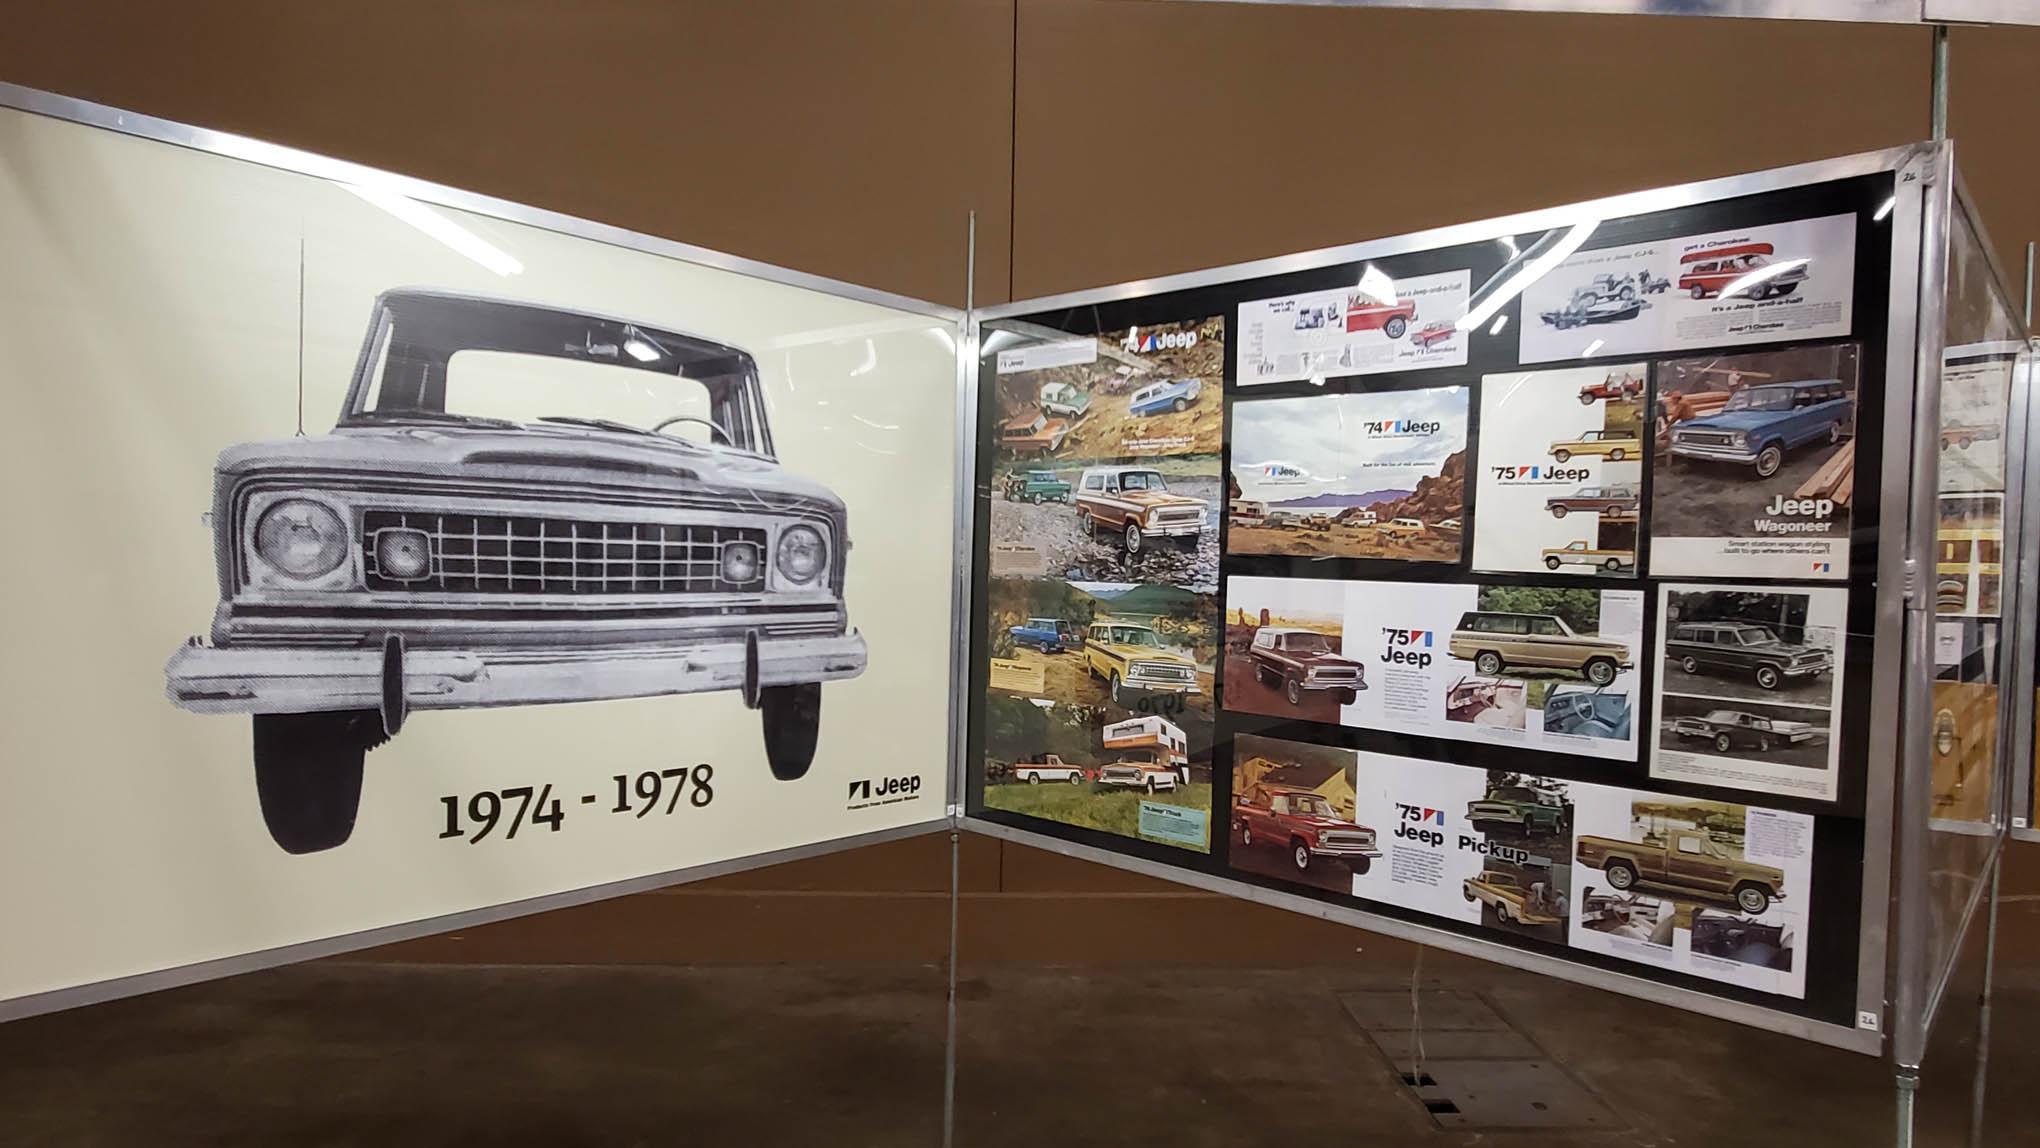 025 toledo jeep fest wagoneers 74 78